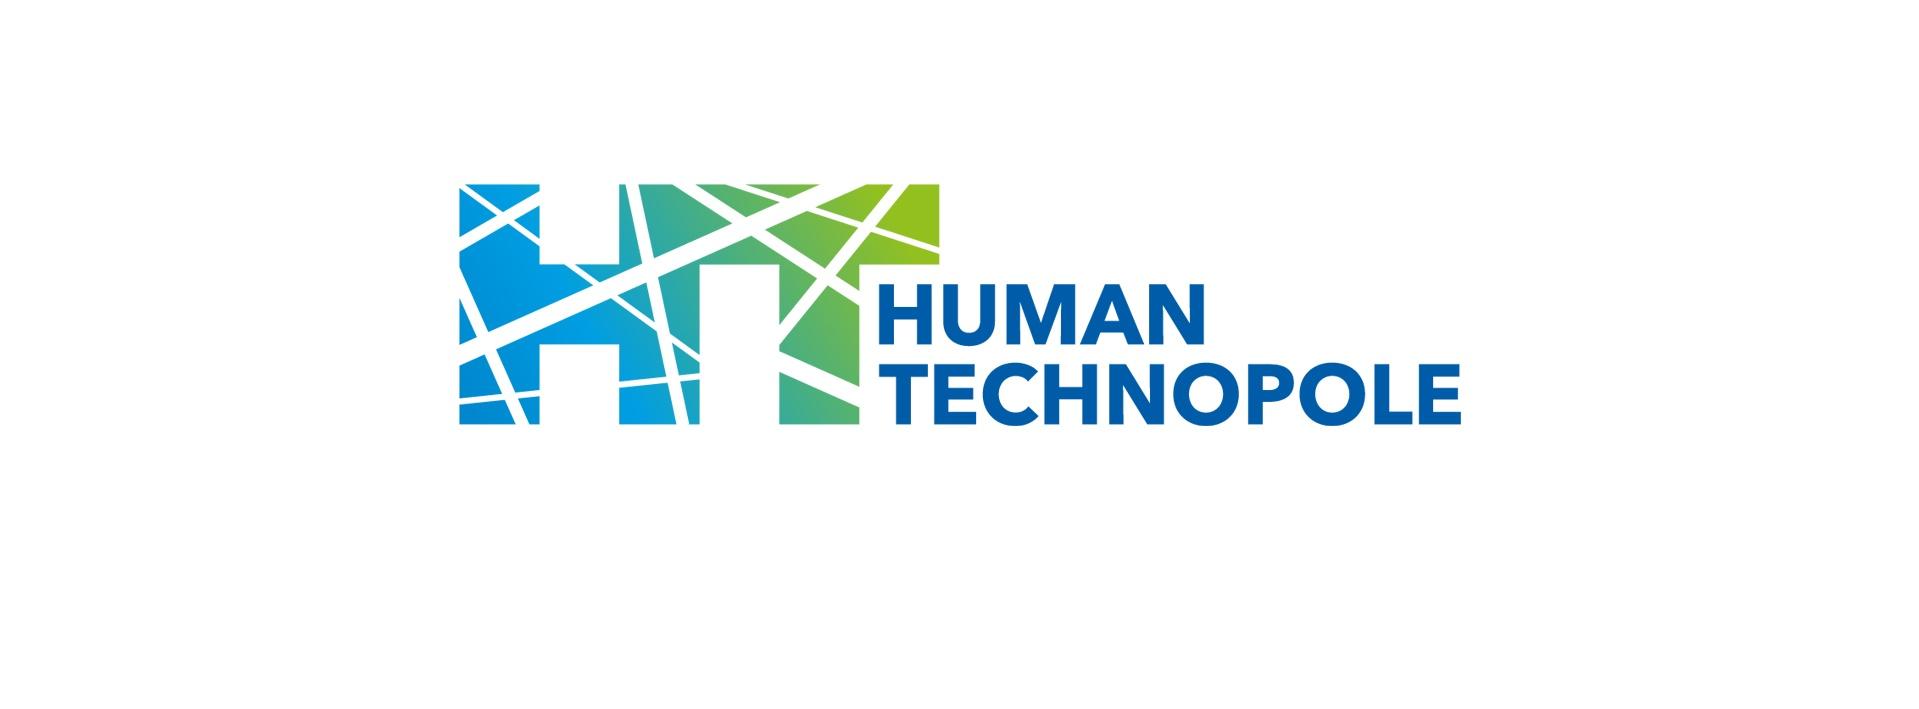 Human Technopole Logo